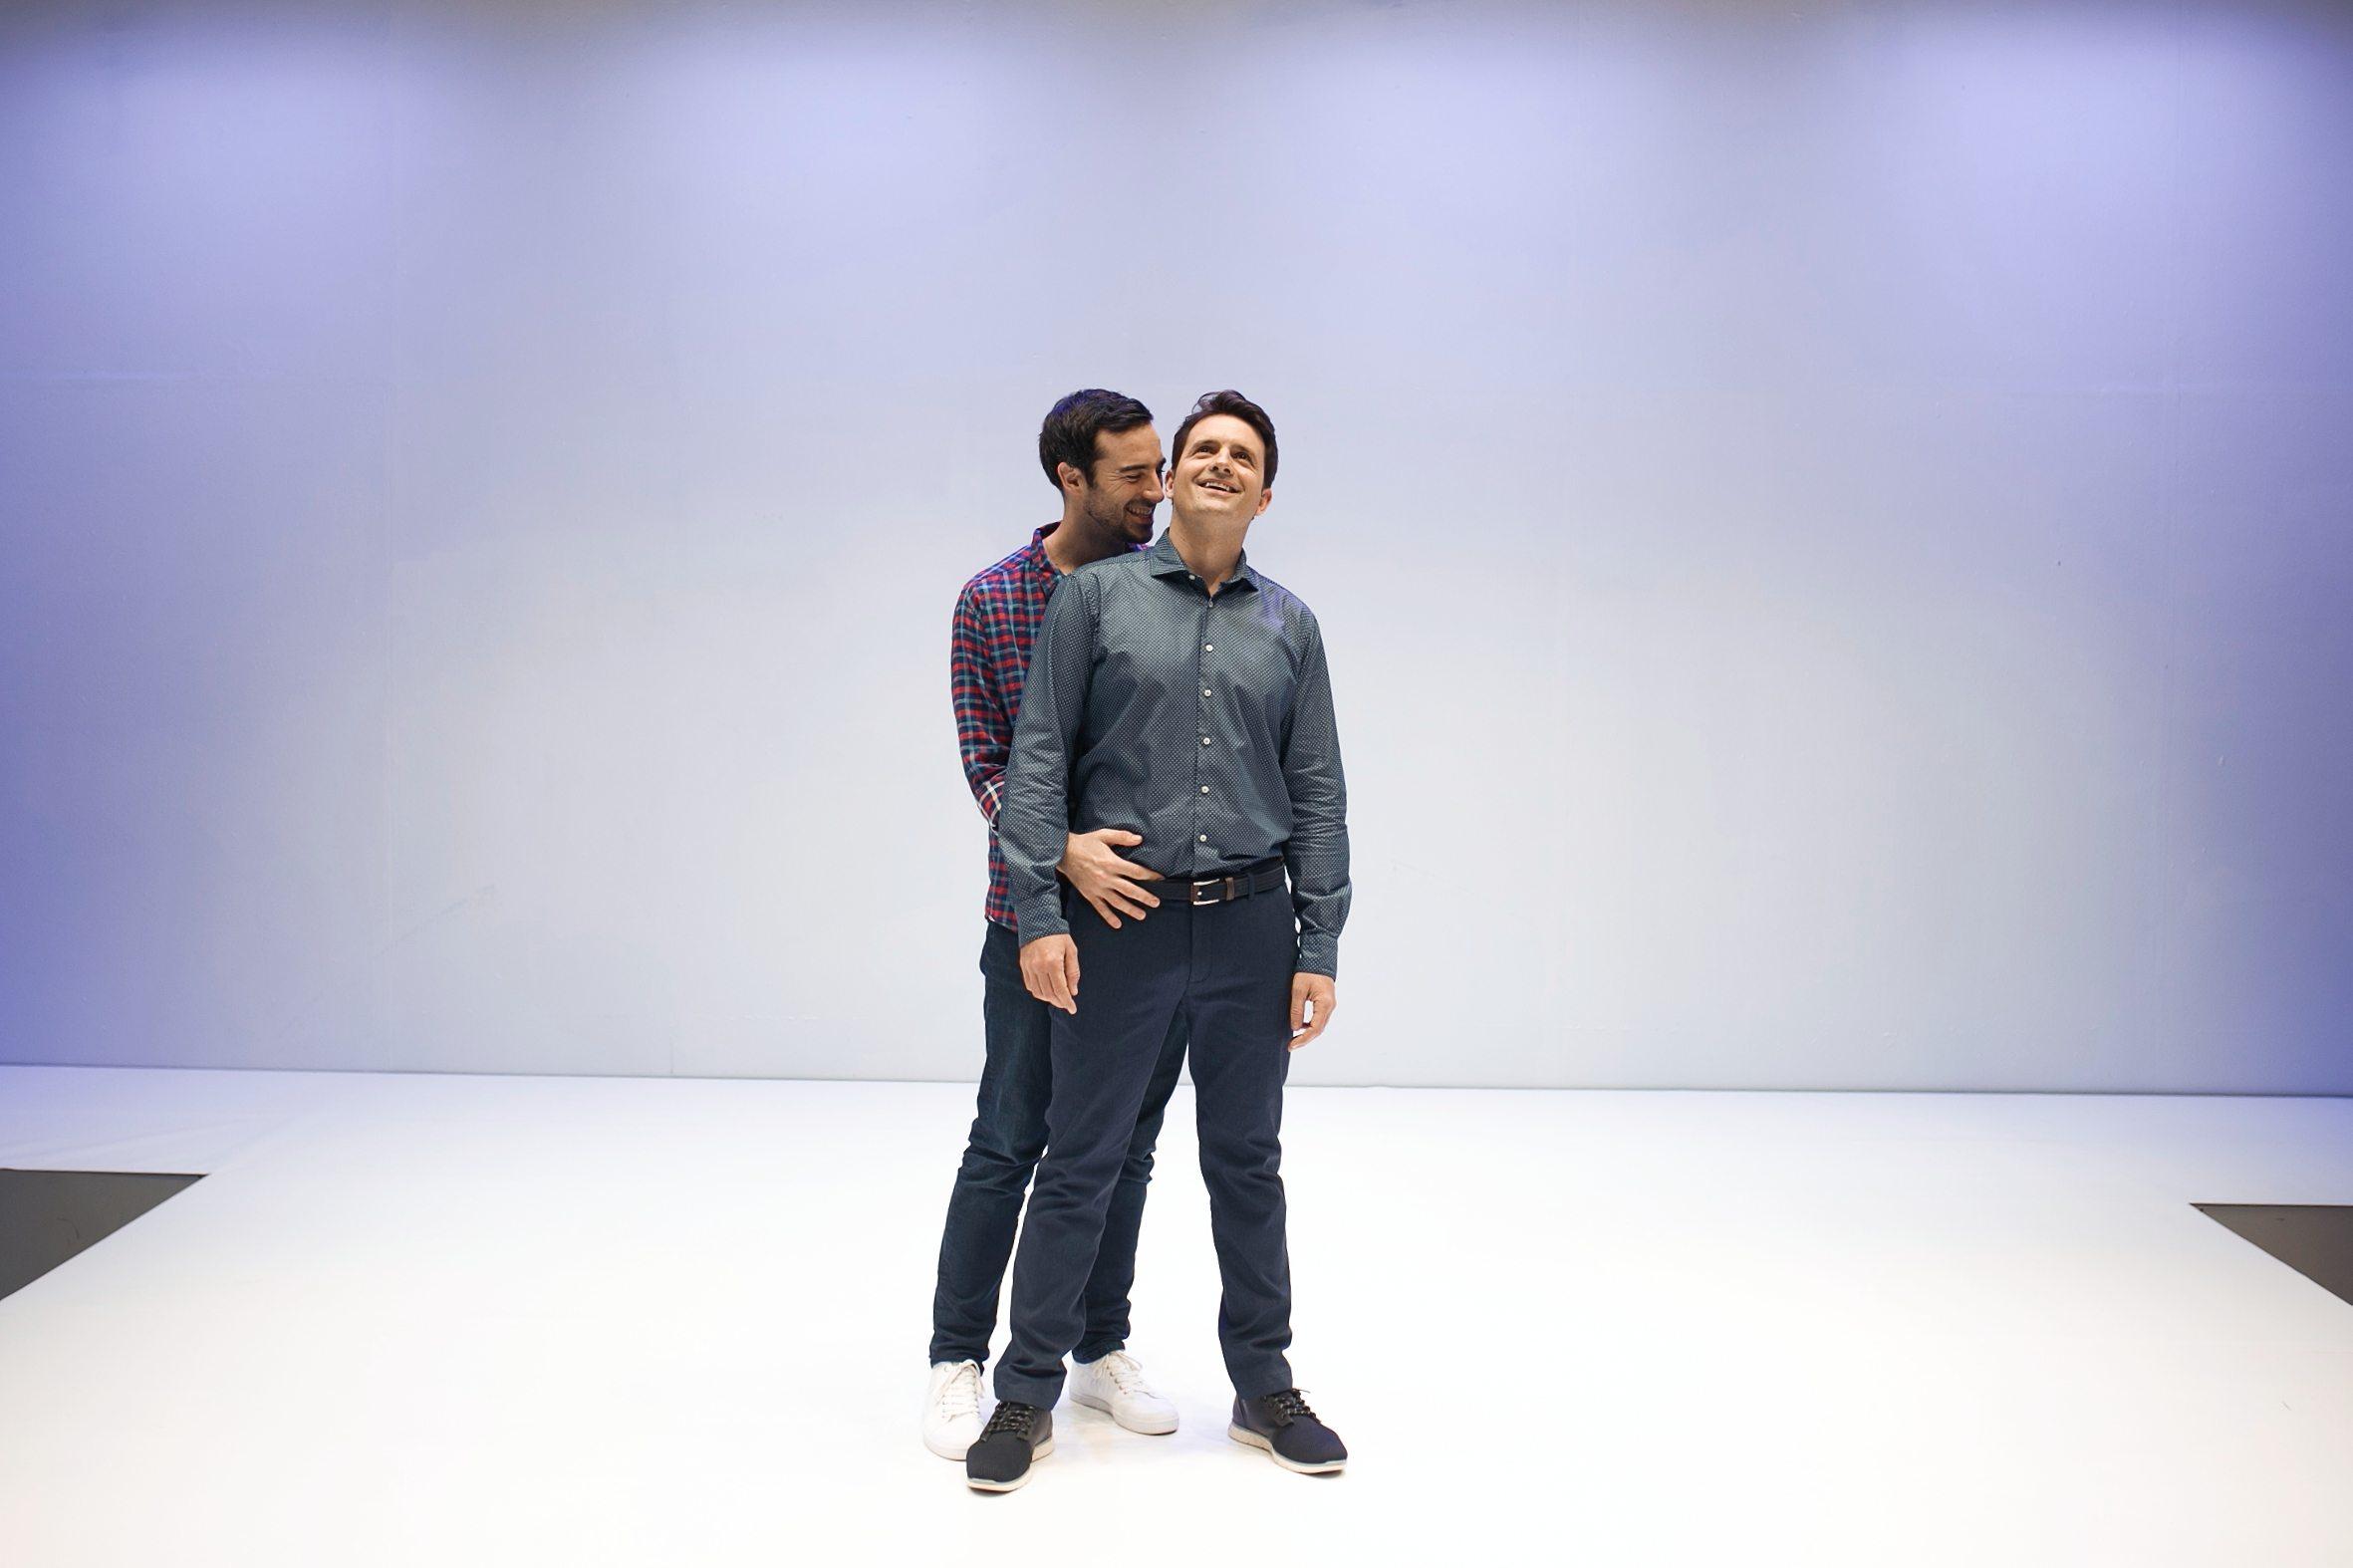 gay-express-COCK-review